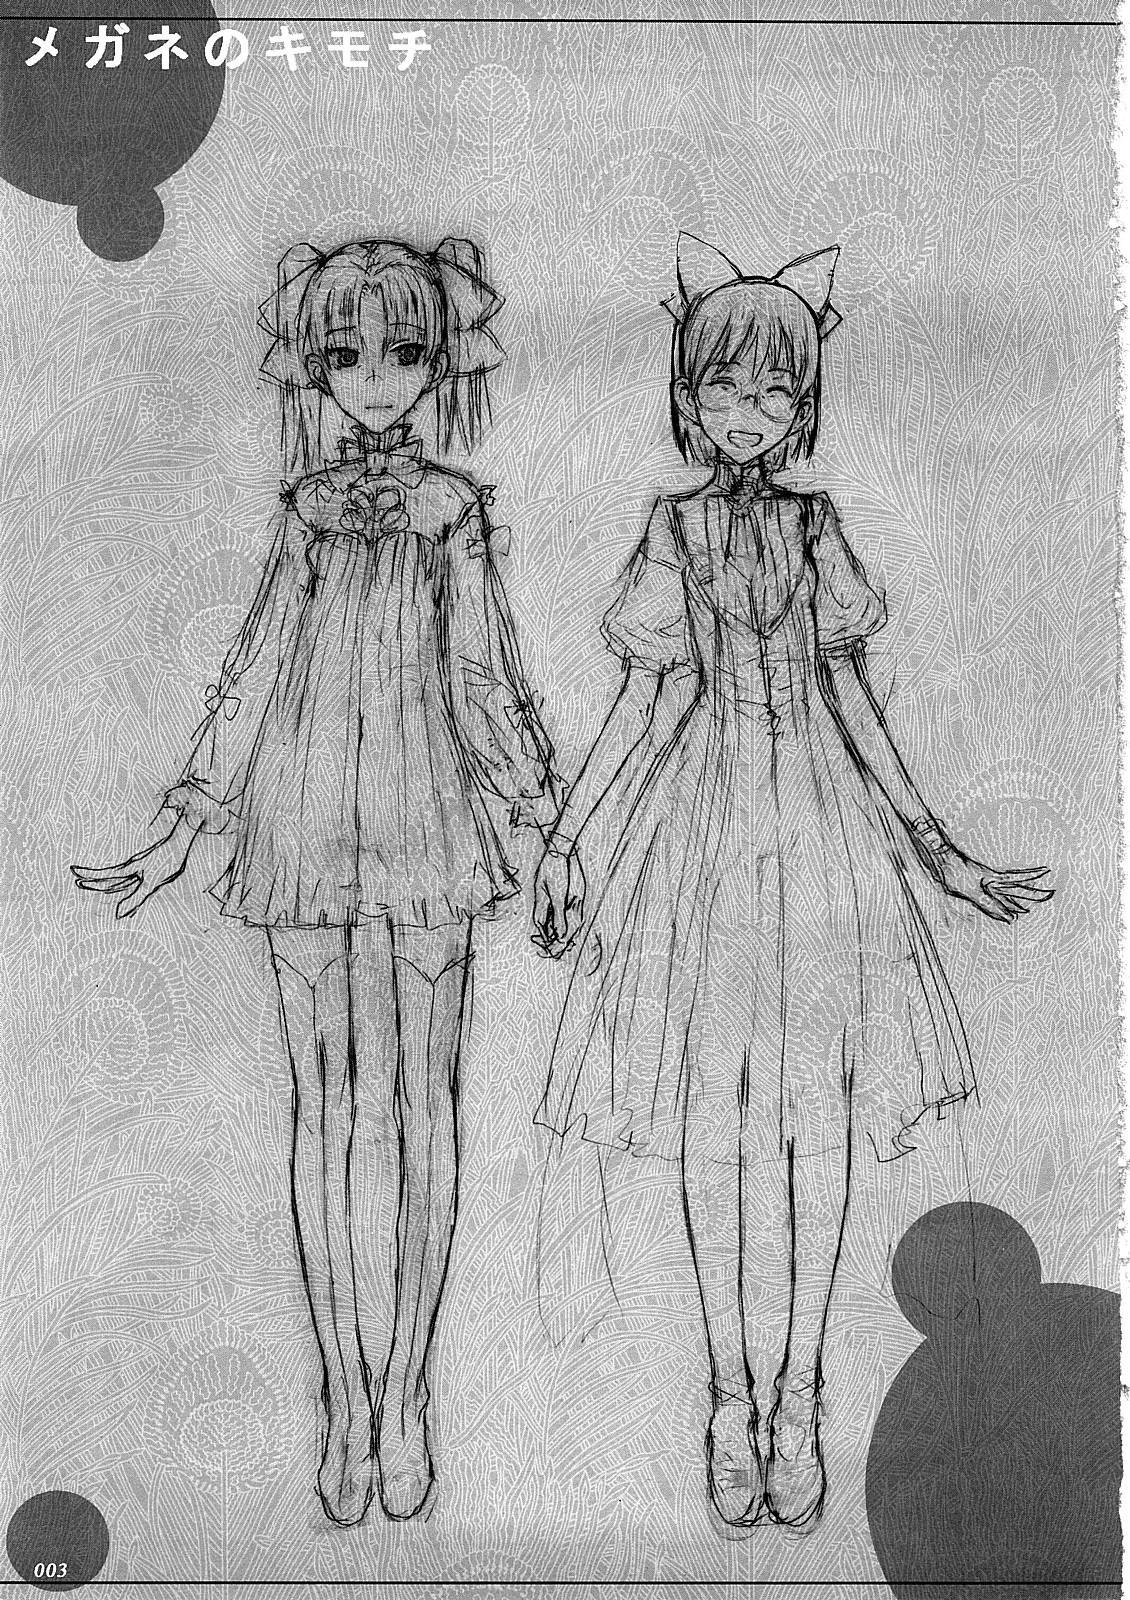 Megane no Kimochi 1